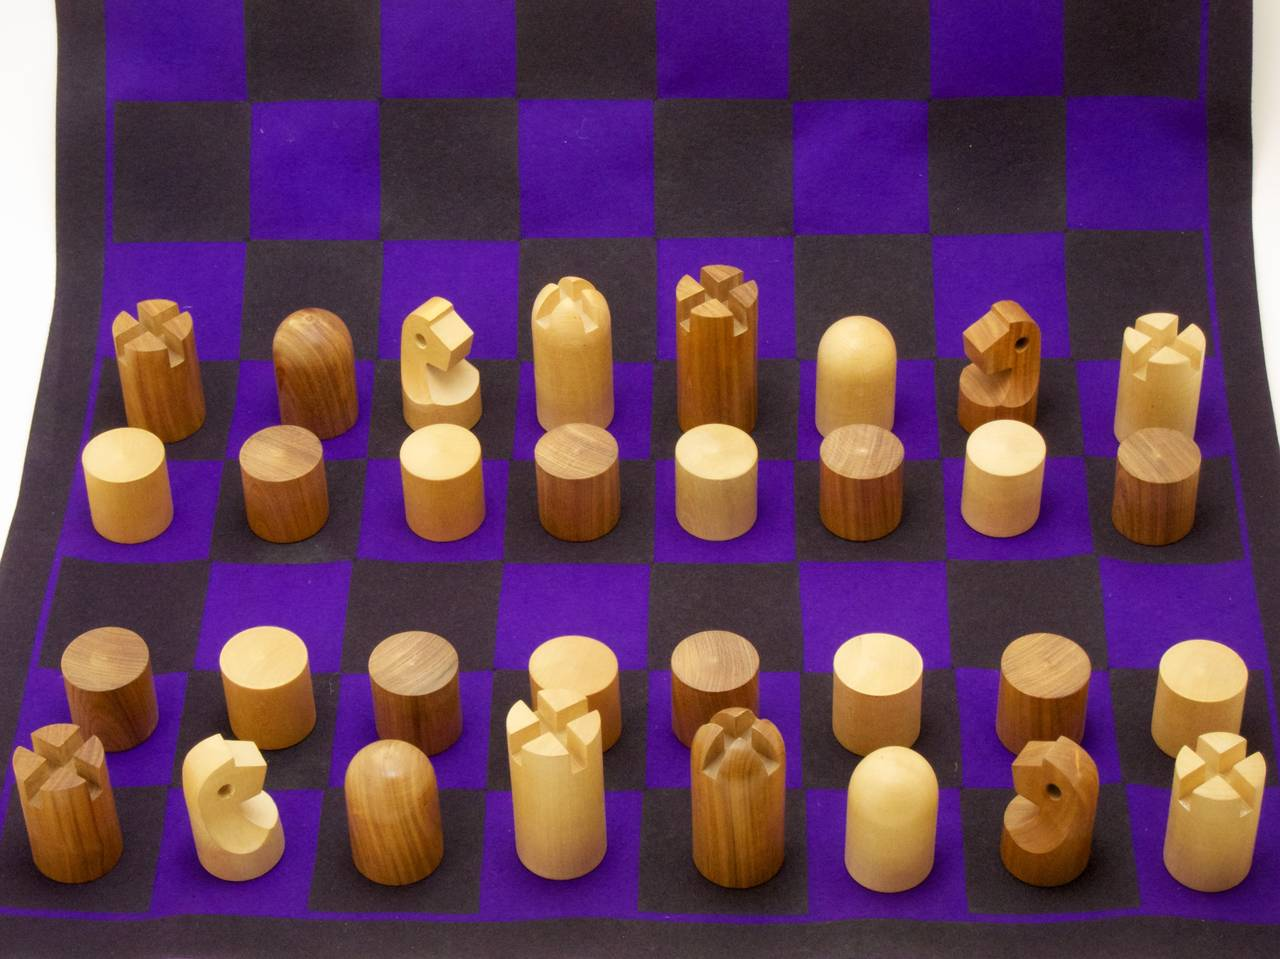 Austrian Minimalist Chess Set by Carl Auböck